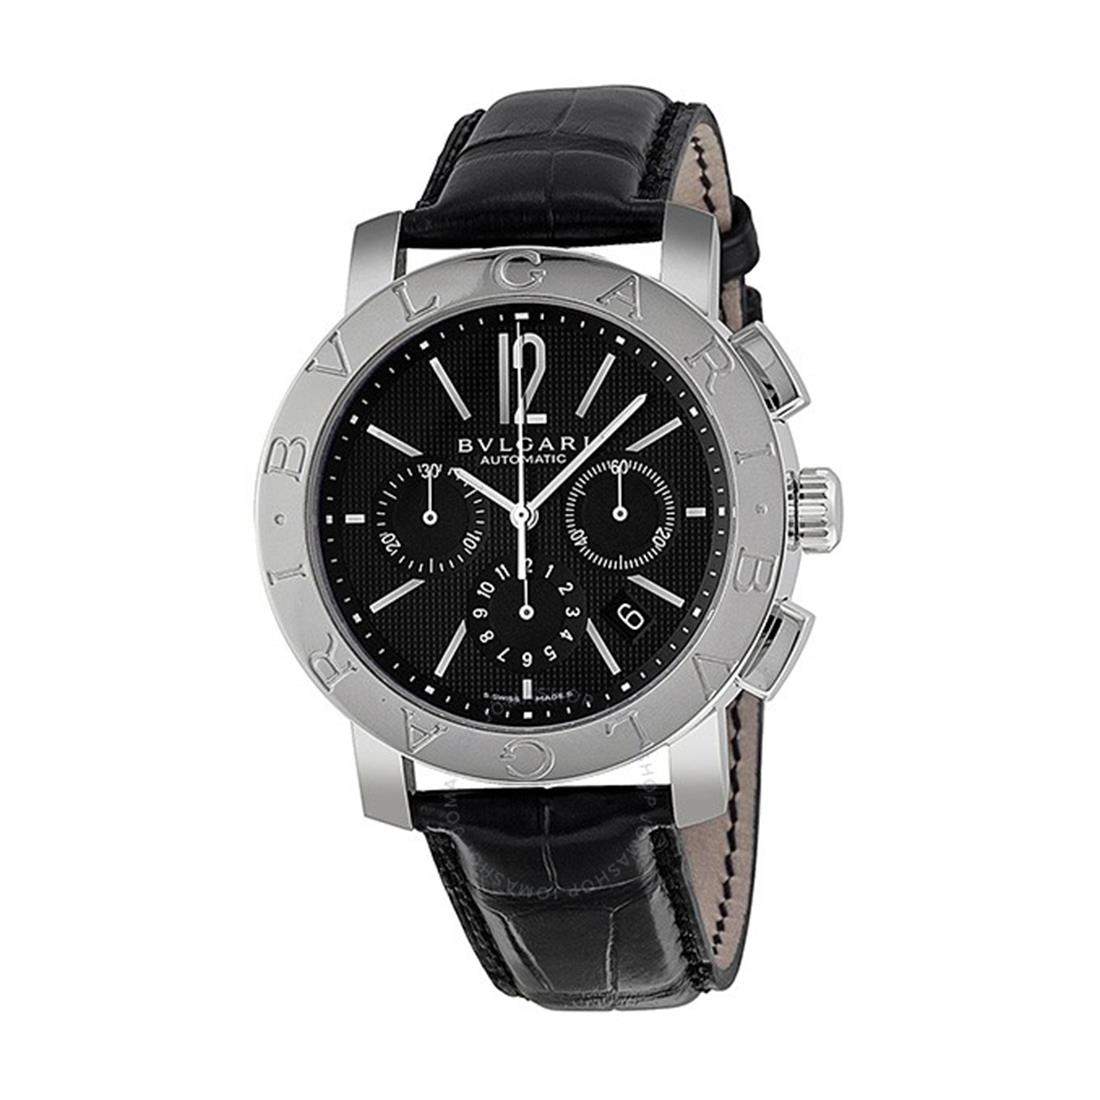 Orologio cronografo cassa 42 mm - BULGARI